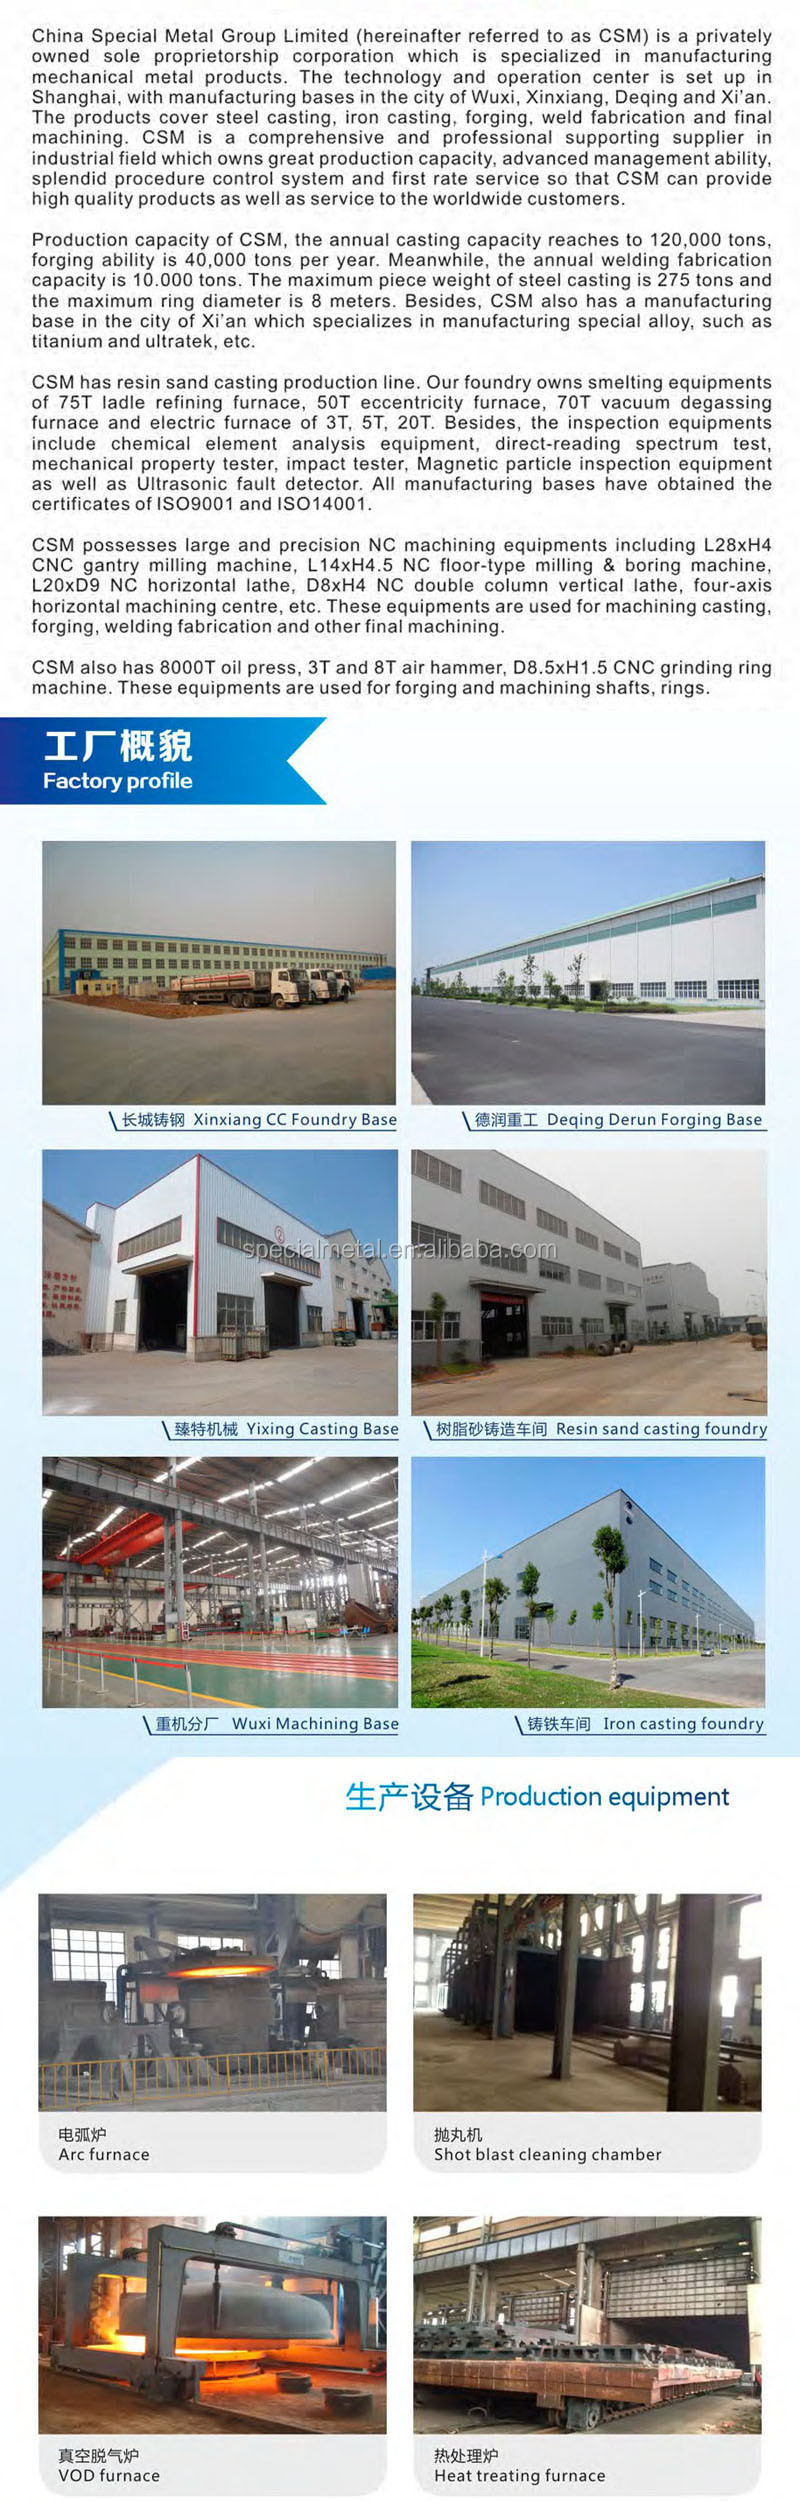 Company information 1.jpg